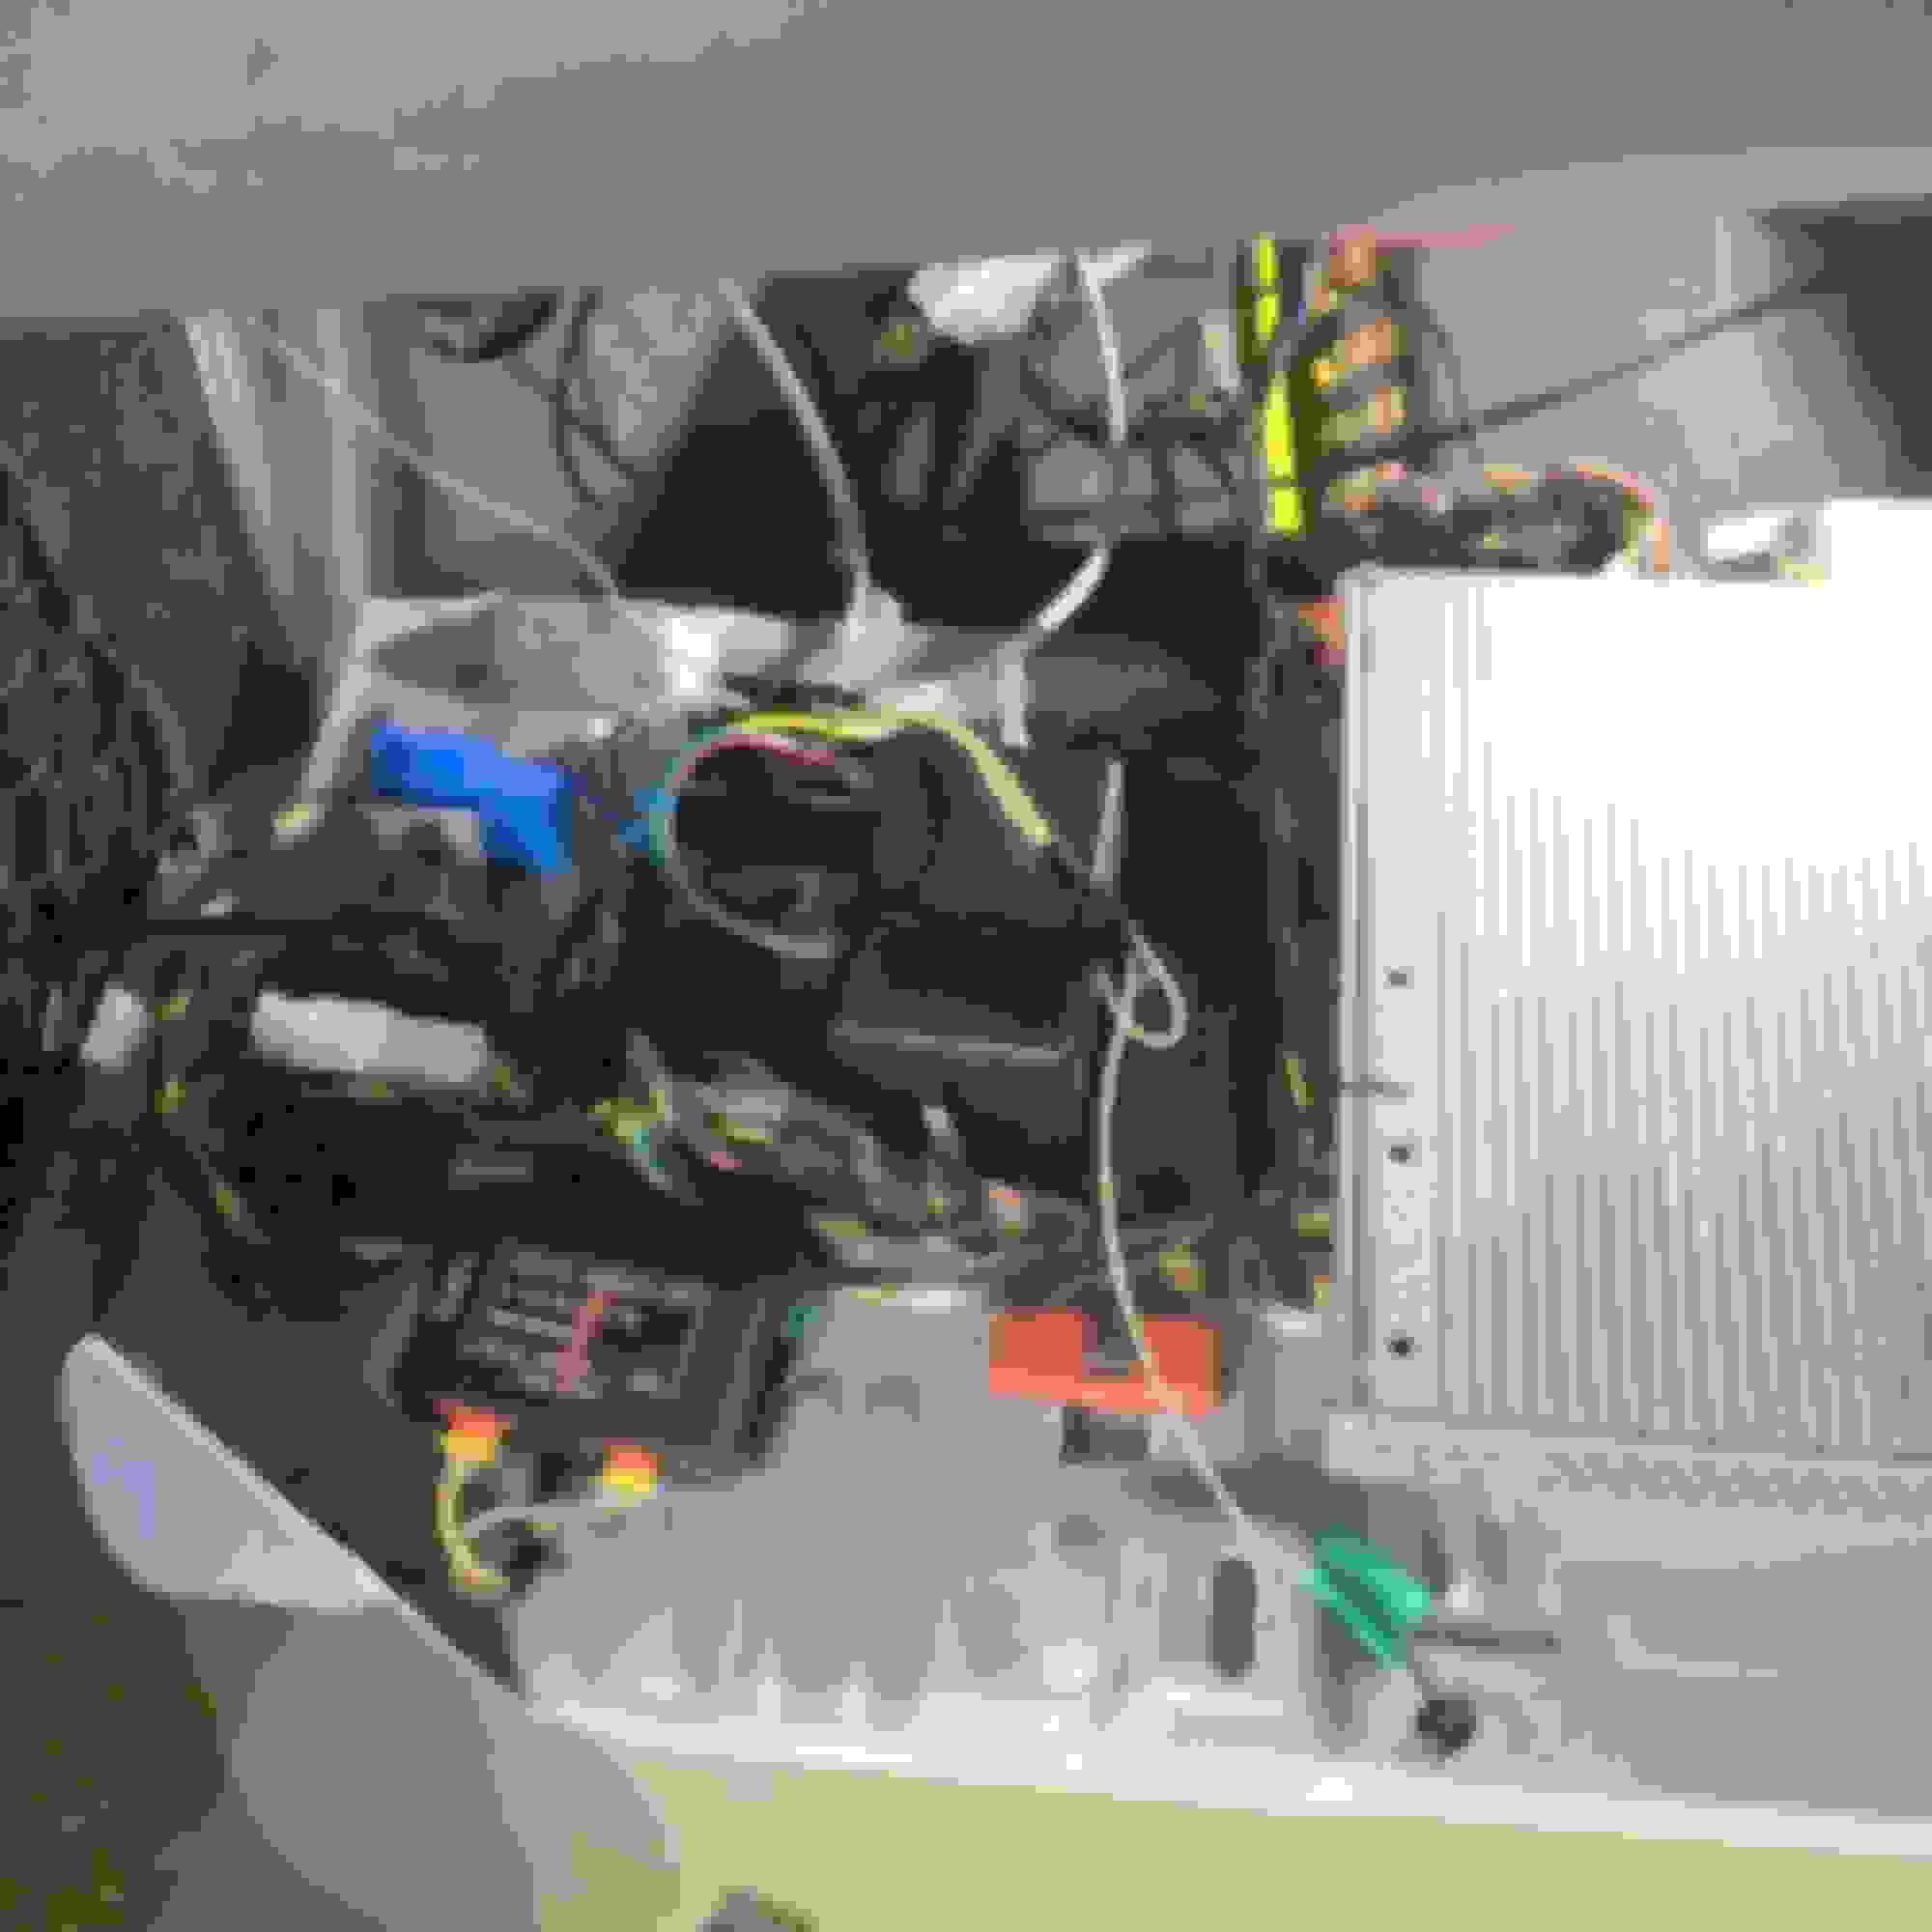 OEM radio wiring to Kenwood - CrossfireForum - The Chrysler ... on